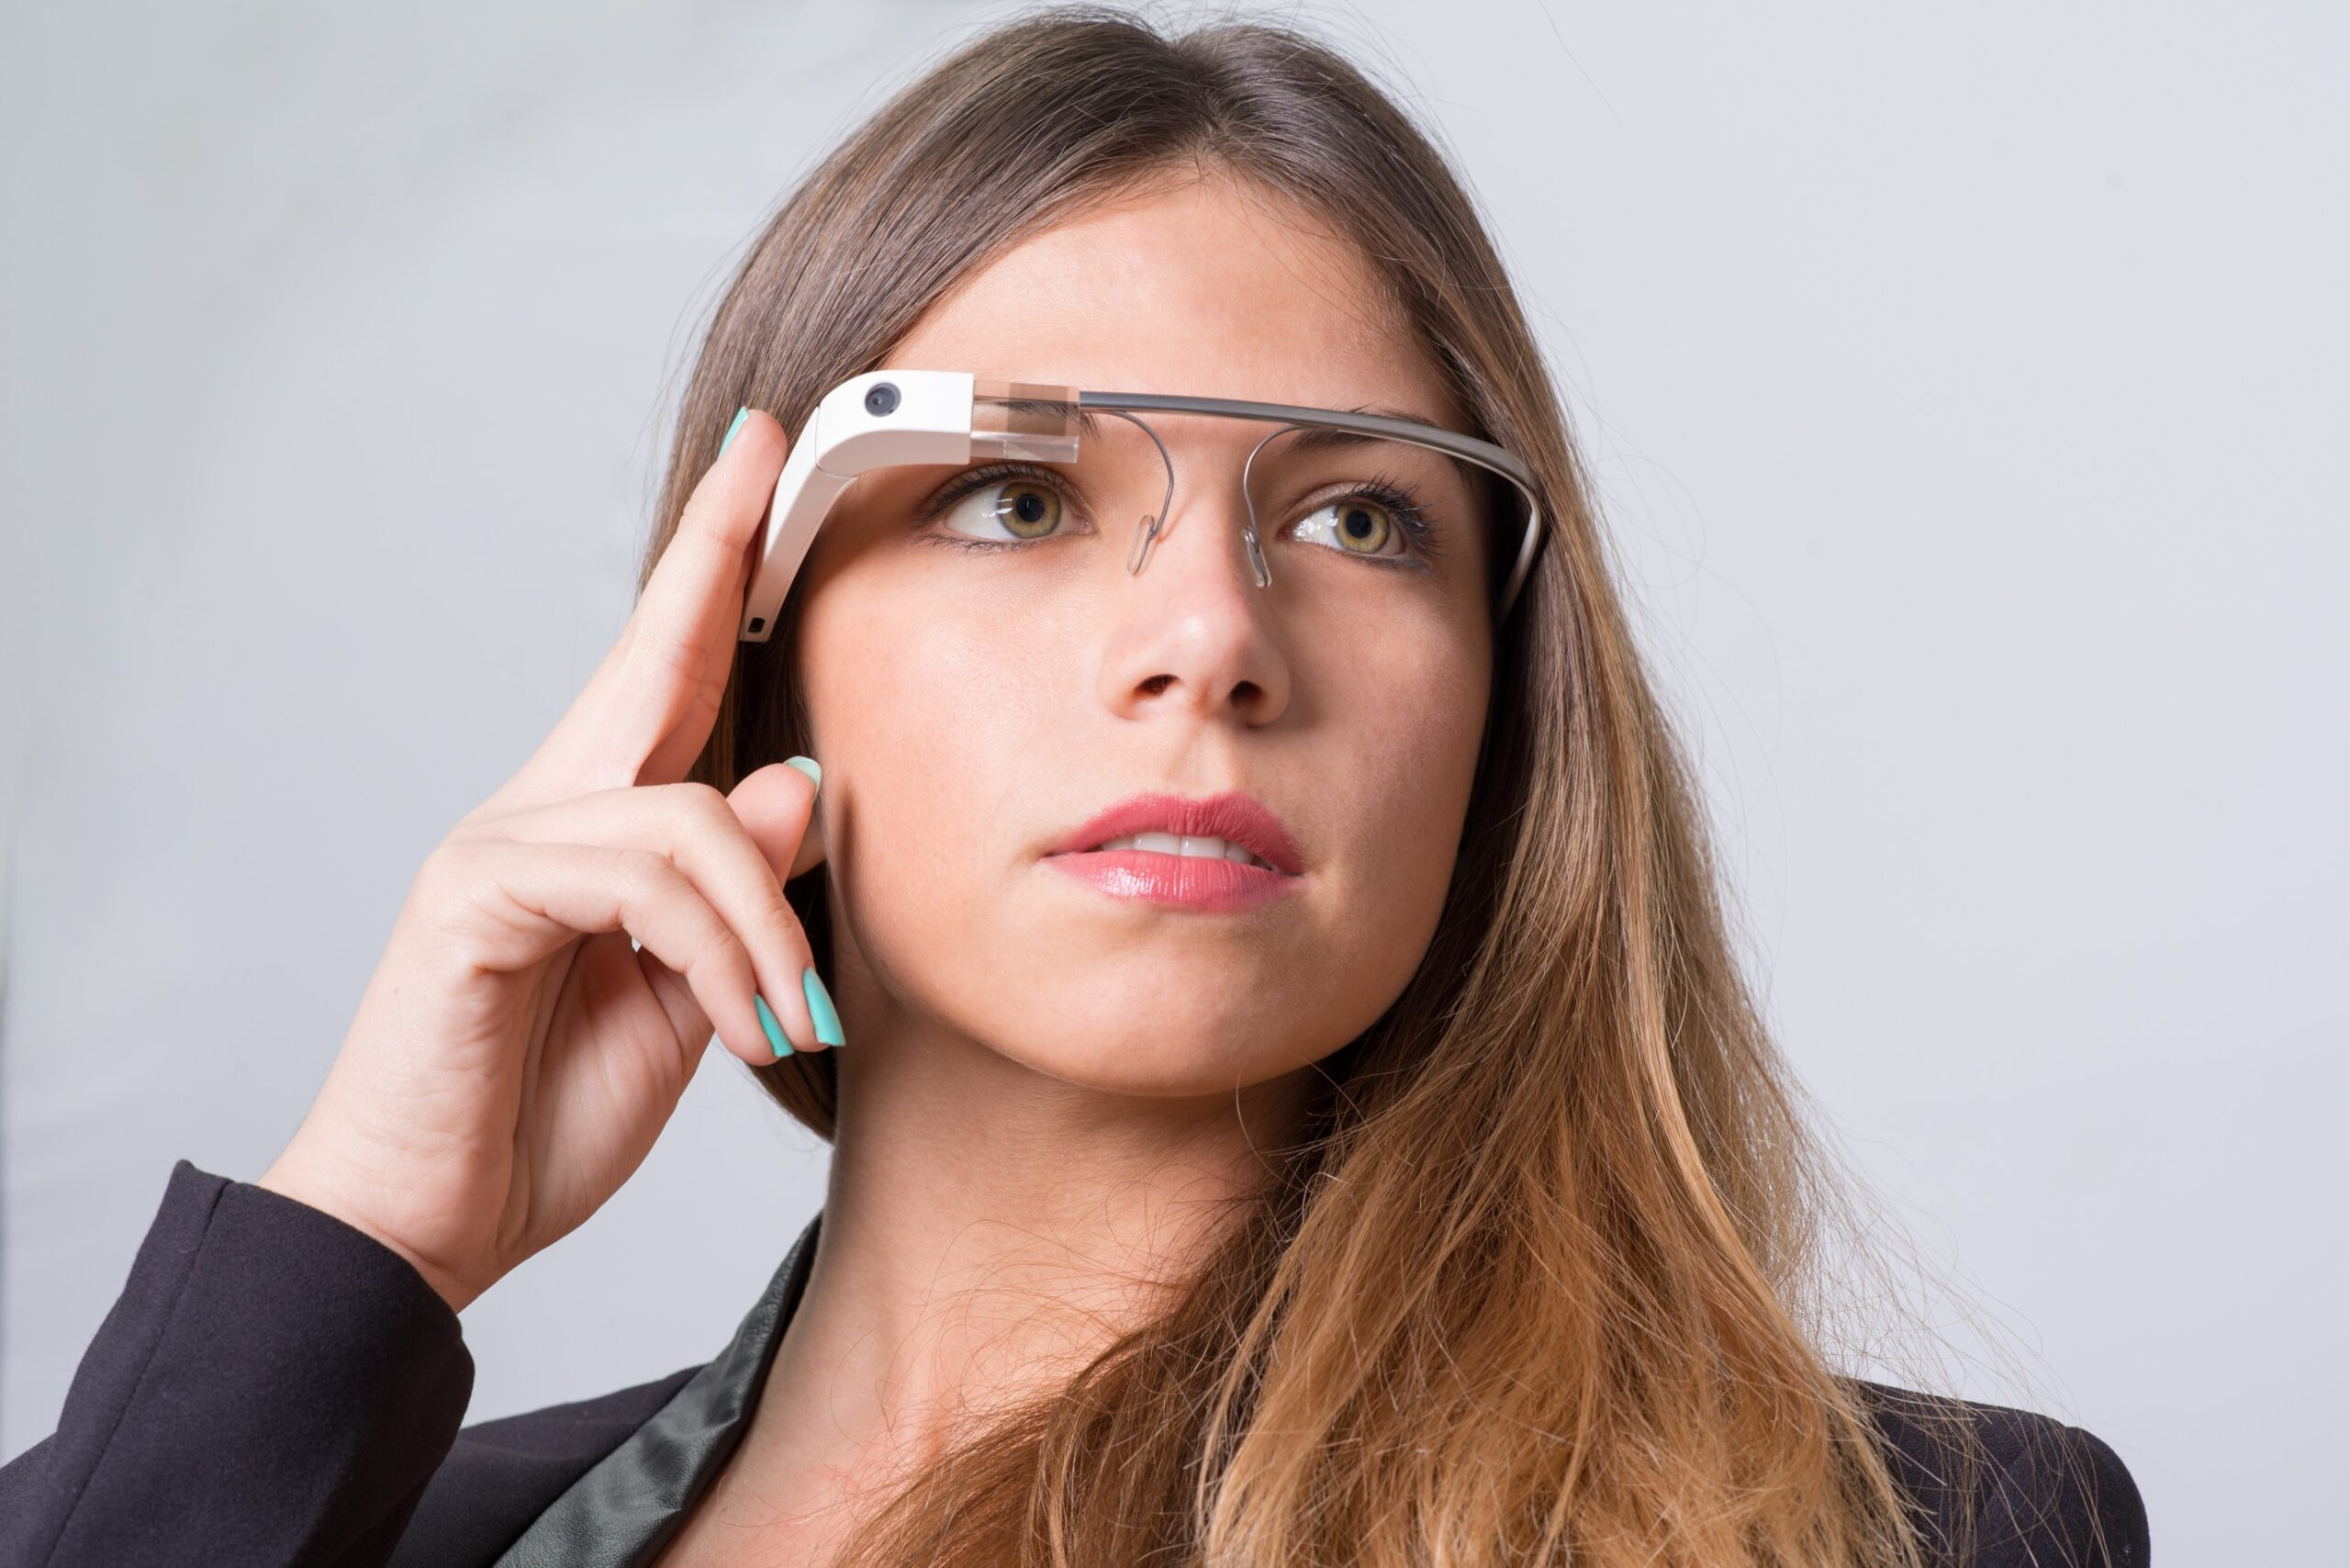 Mulher usando Google Glass